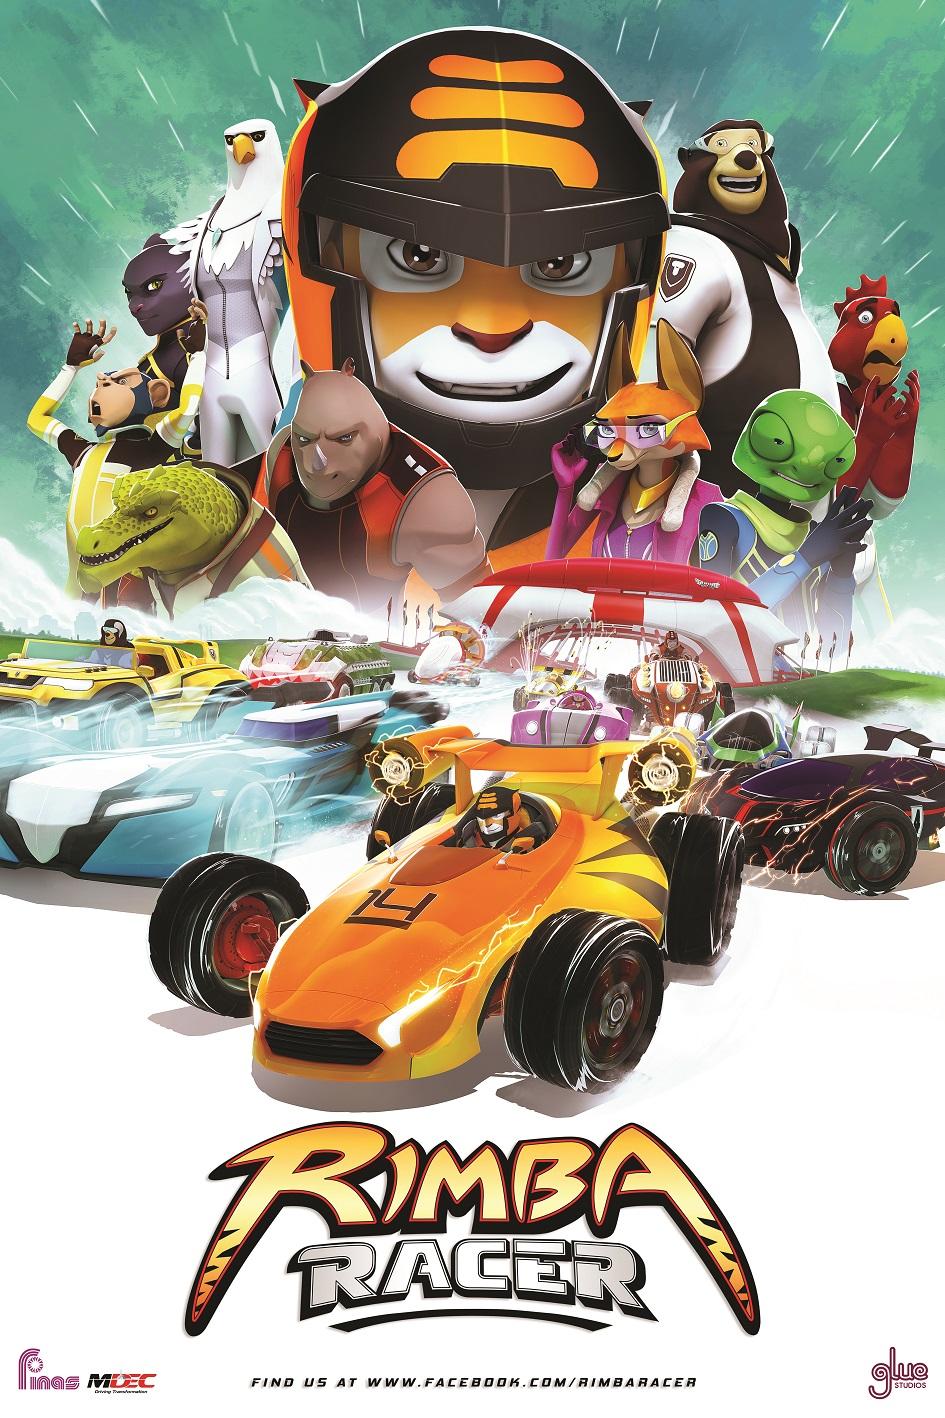 rimba-racer